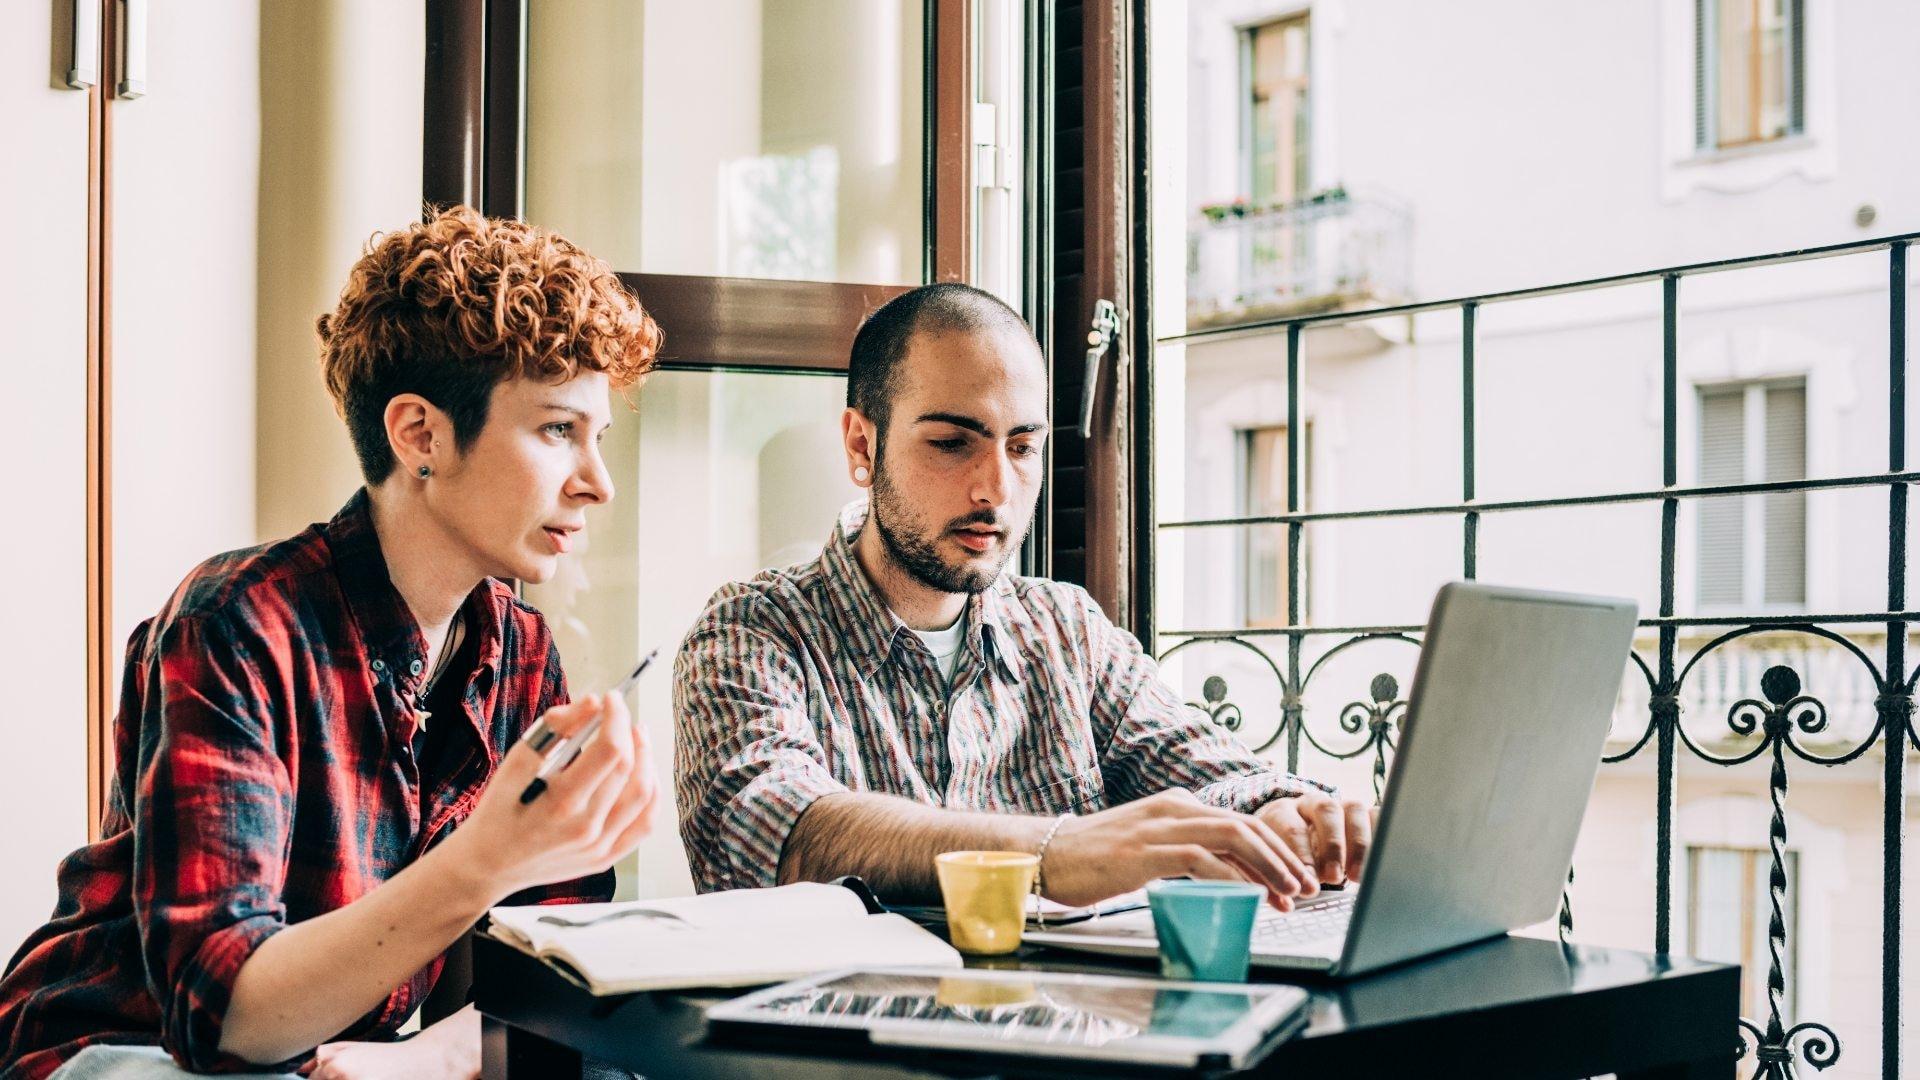 Build an online business from scratch